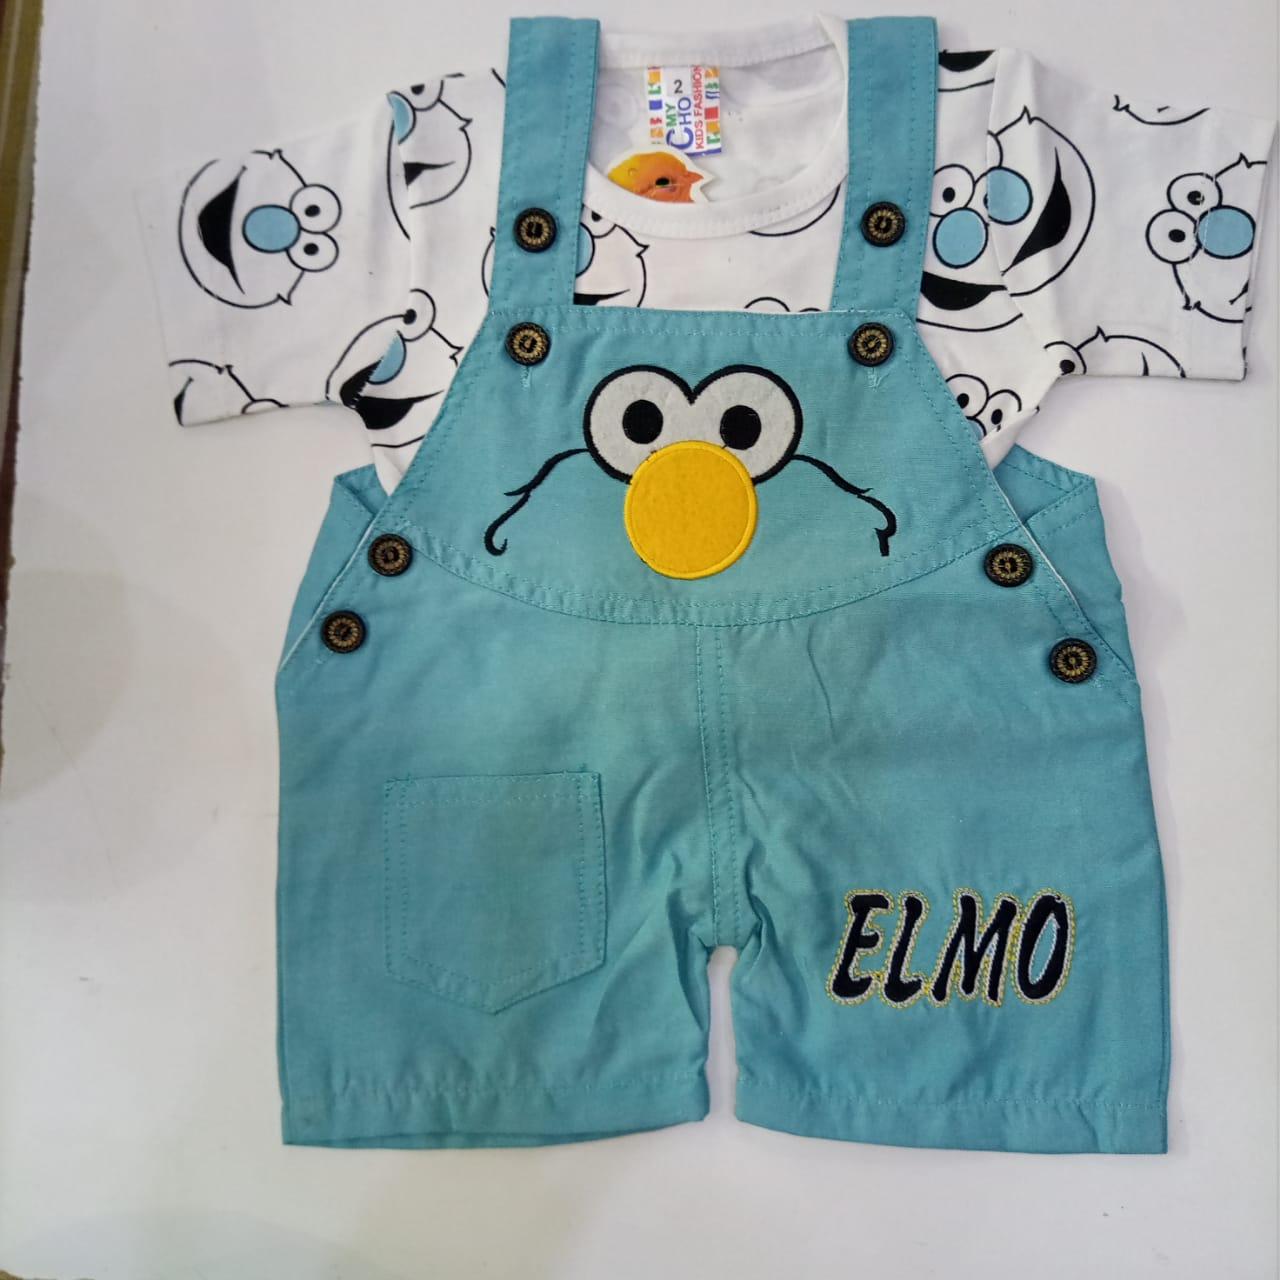 Atfaal Interlock Elmo Romper For Born Baby 3-6, 6-9 Months Gender:Unisex